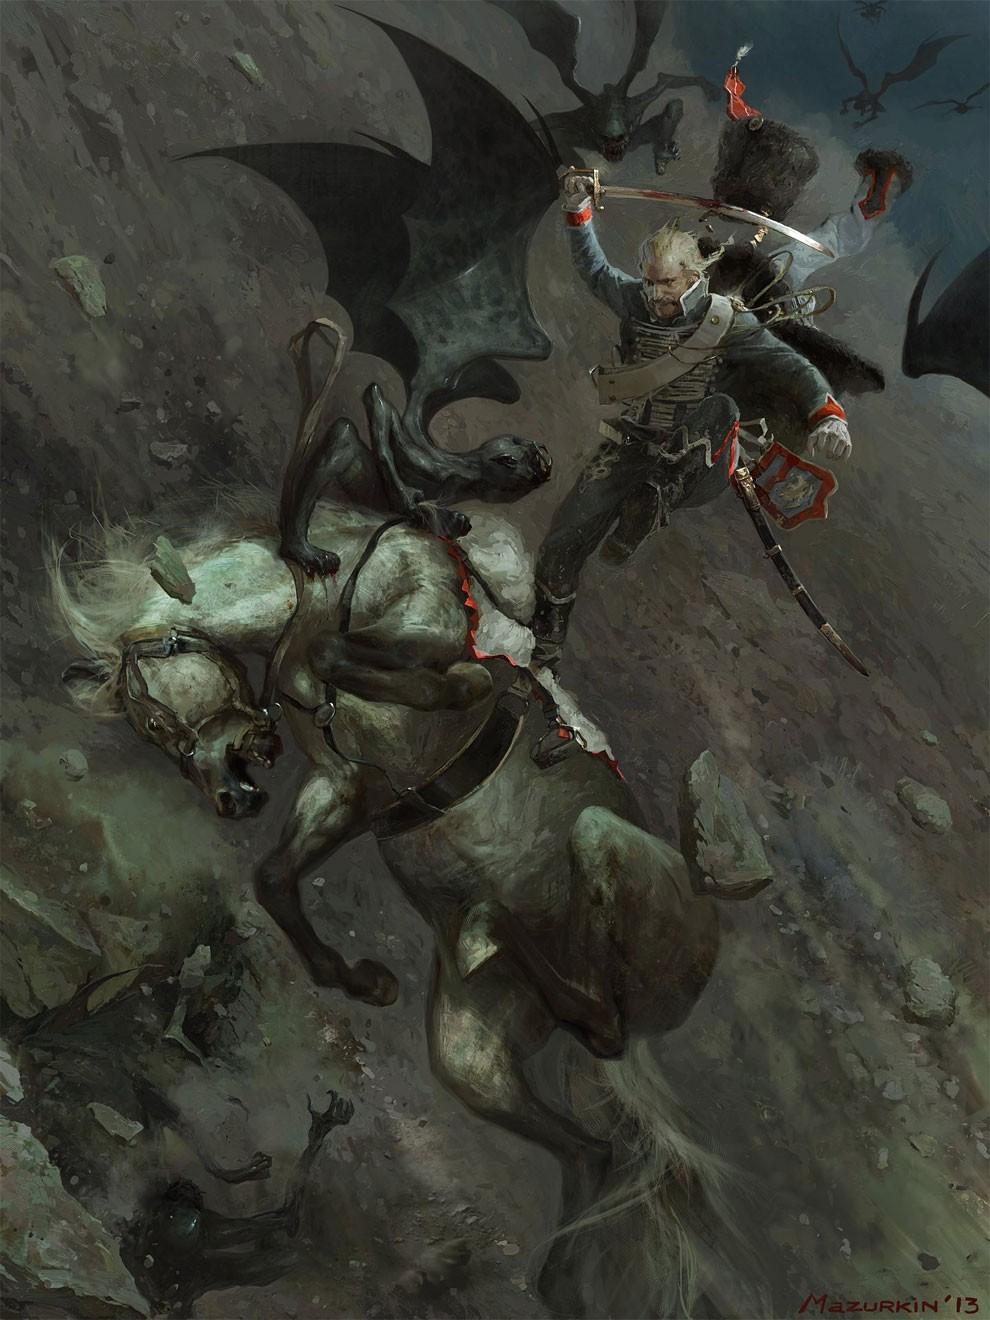 digital-art-dark-fantasy-horror-yuriy-mazurkin-22